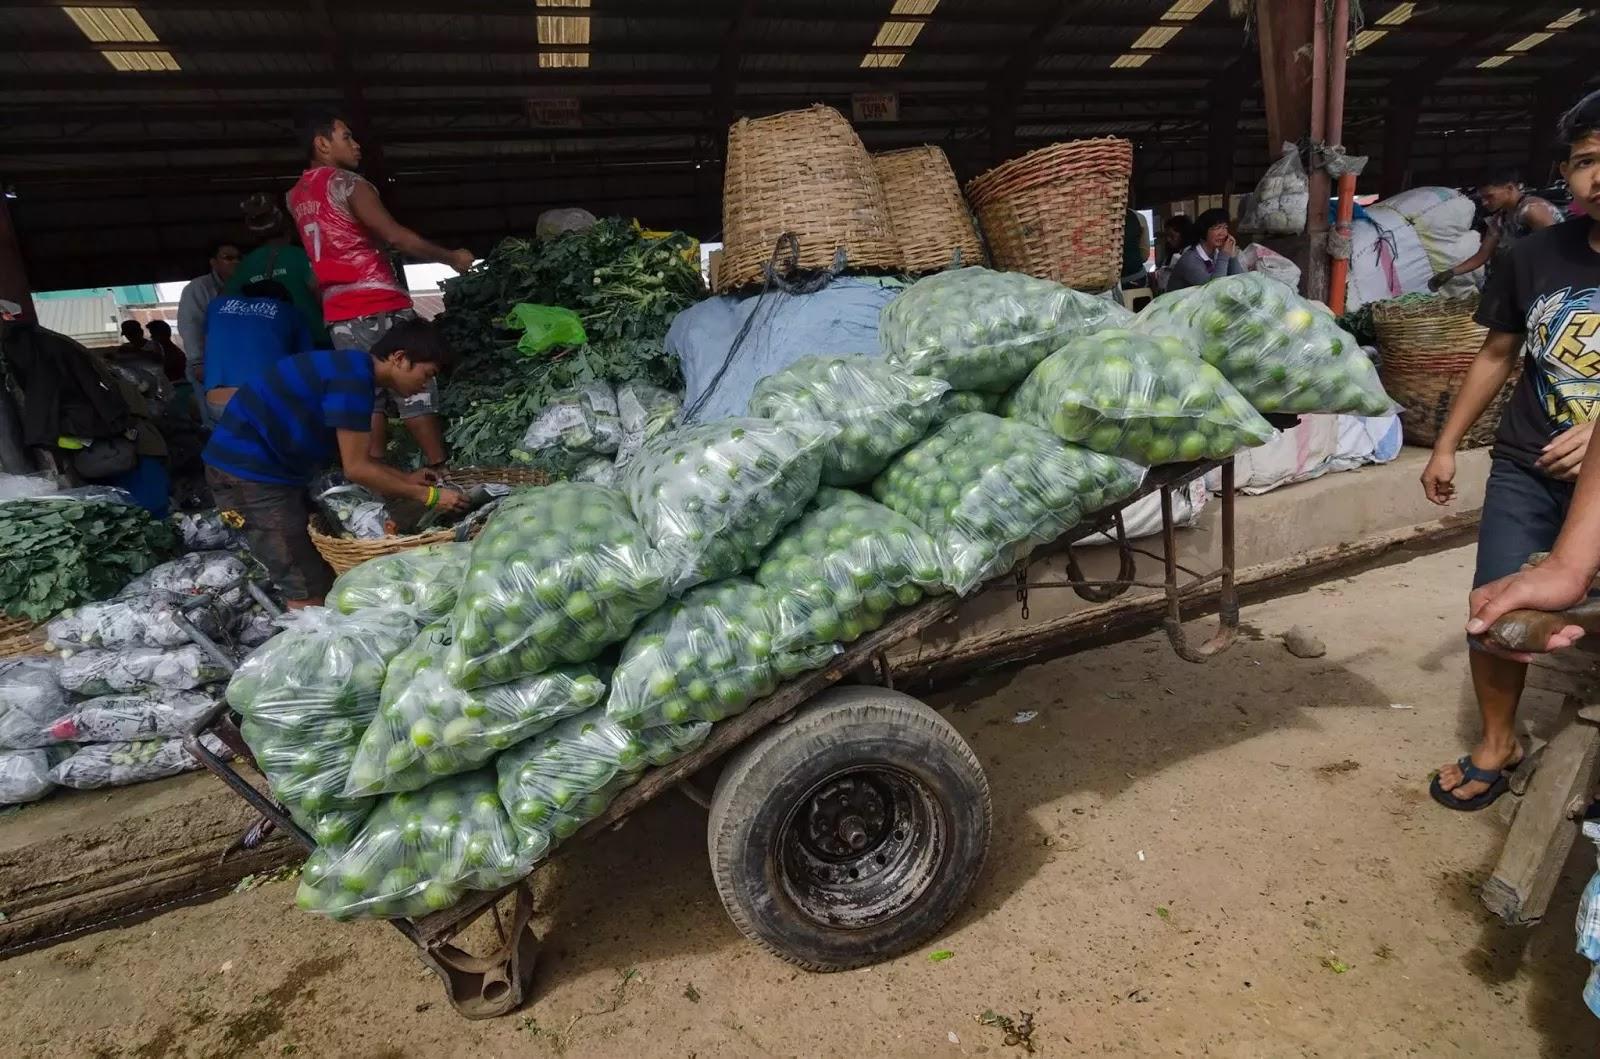 A Modern Porter's Cart Lemon Produce Trading Post La Trinidad Benguet Cordillera Administrative Region Philippines